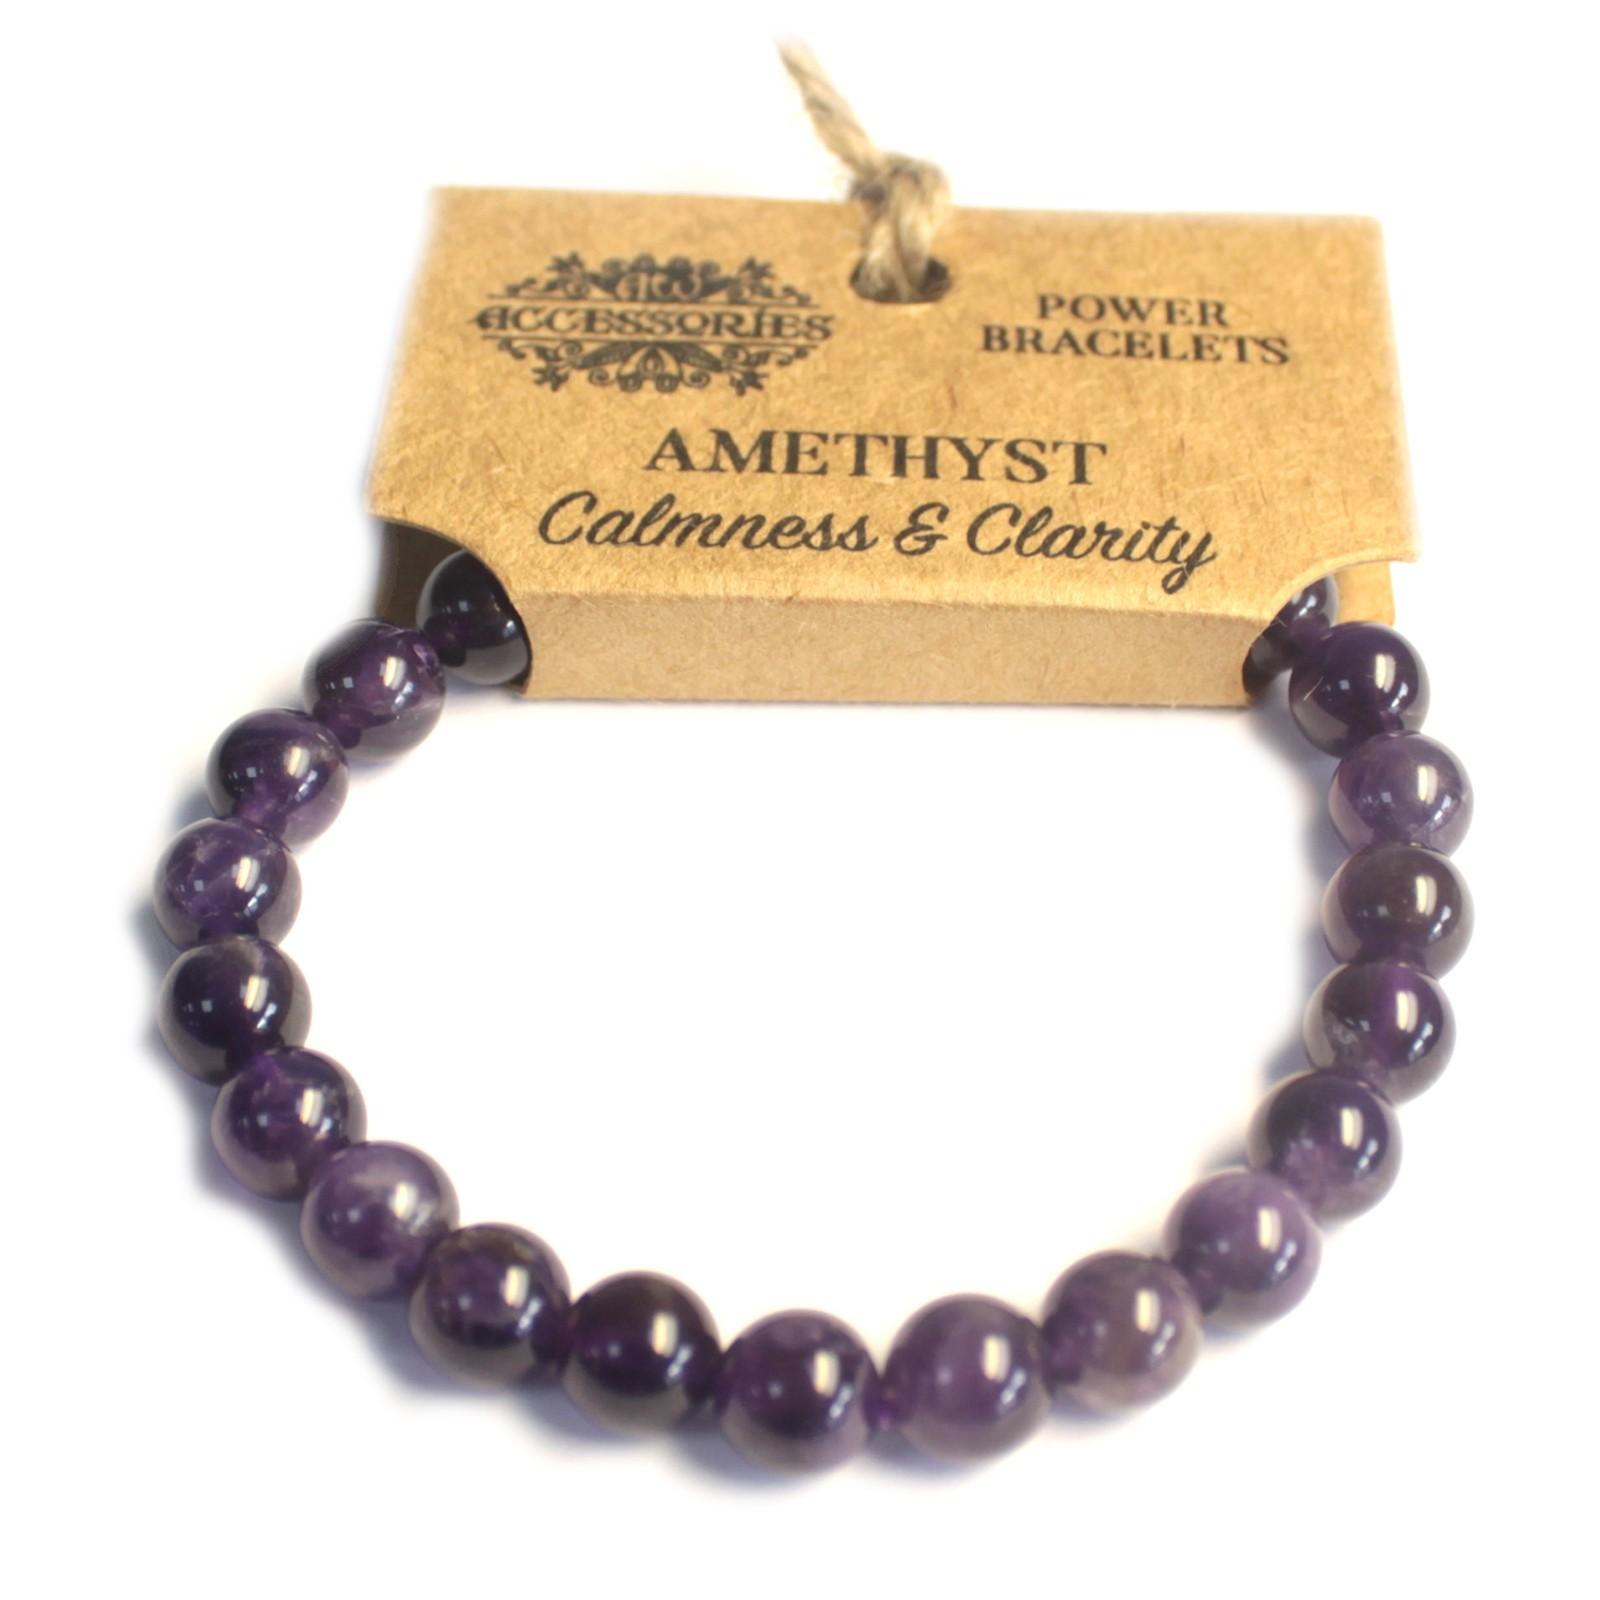 Power Bracelet Amethyst